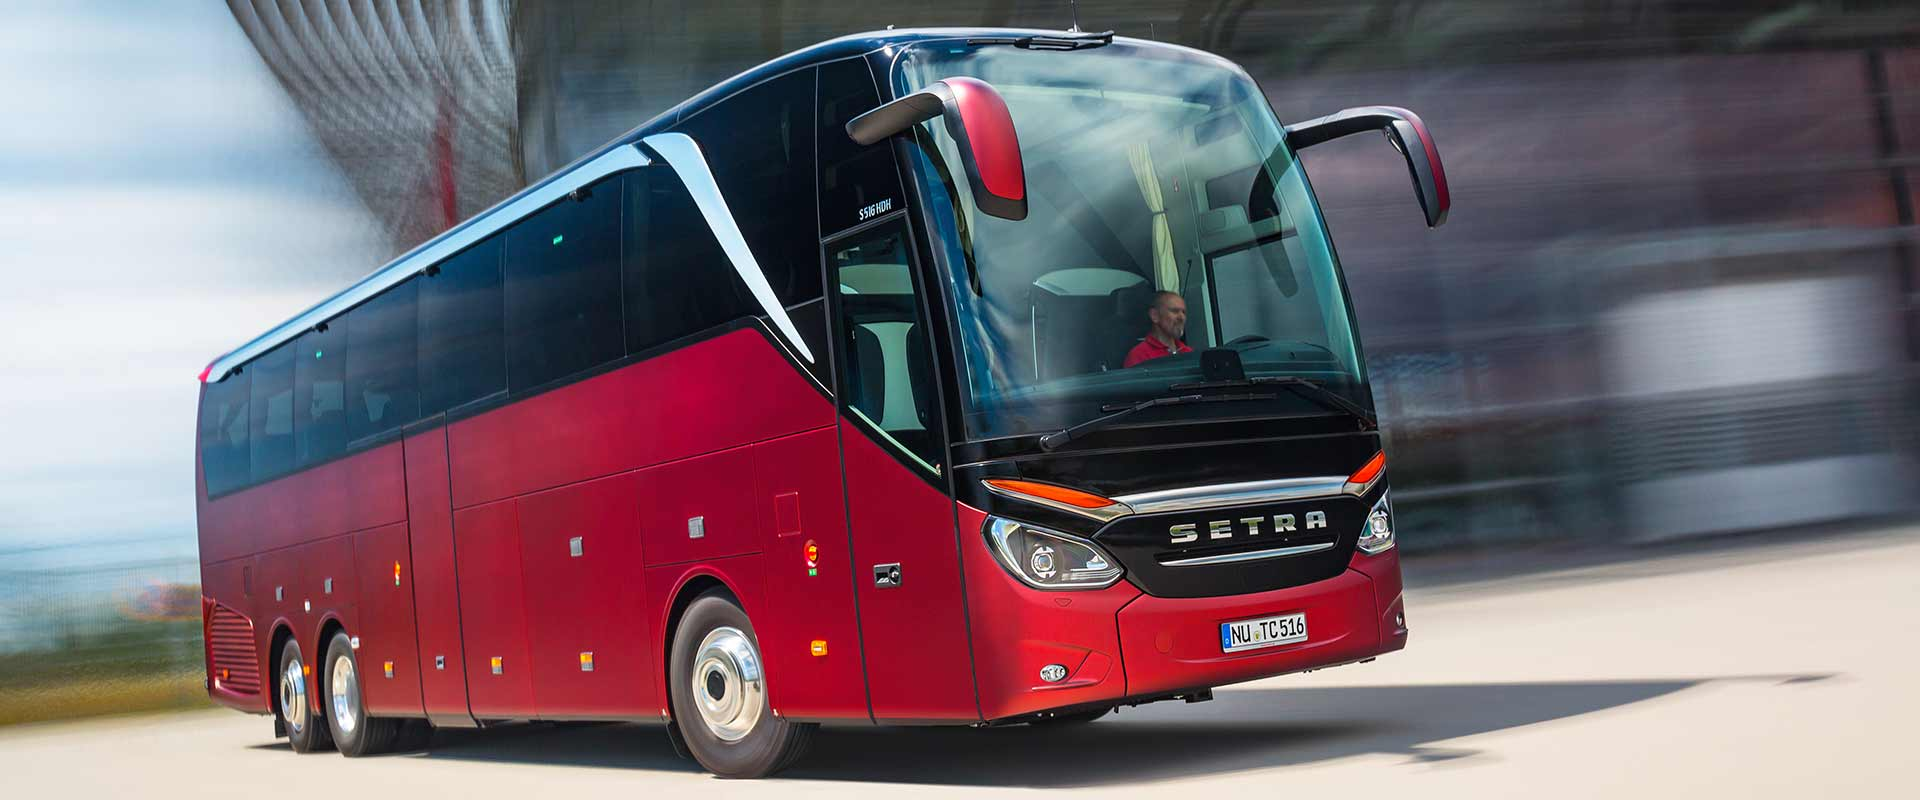 roter setra Bus